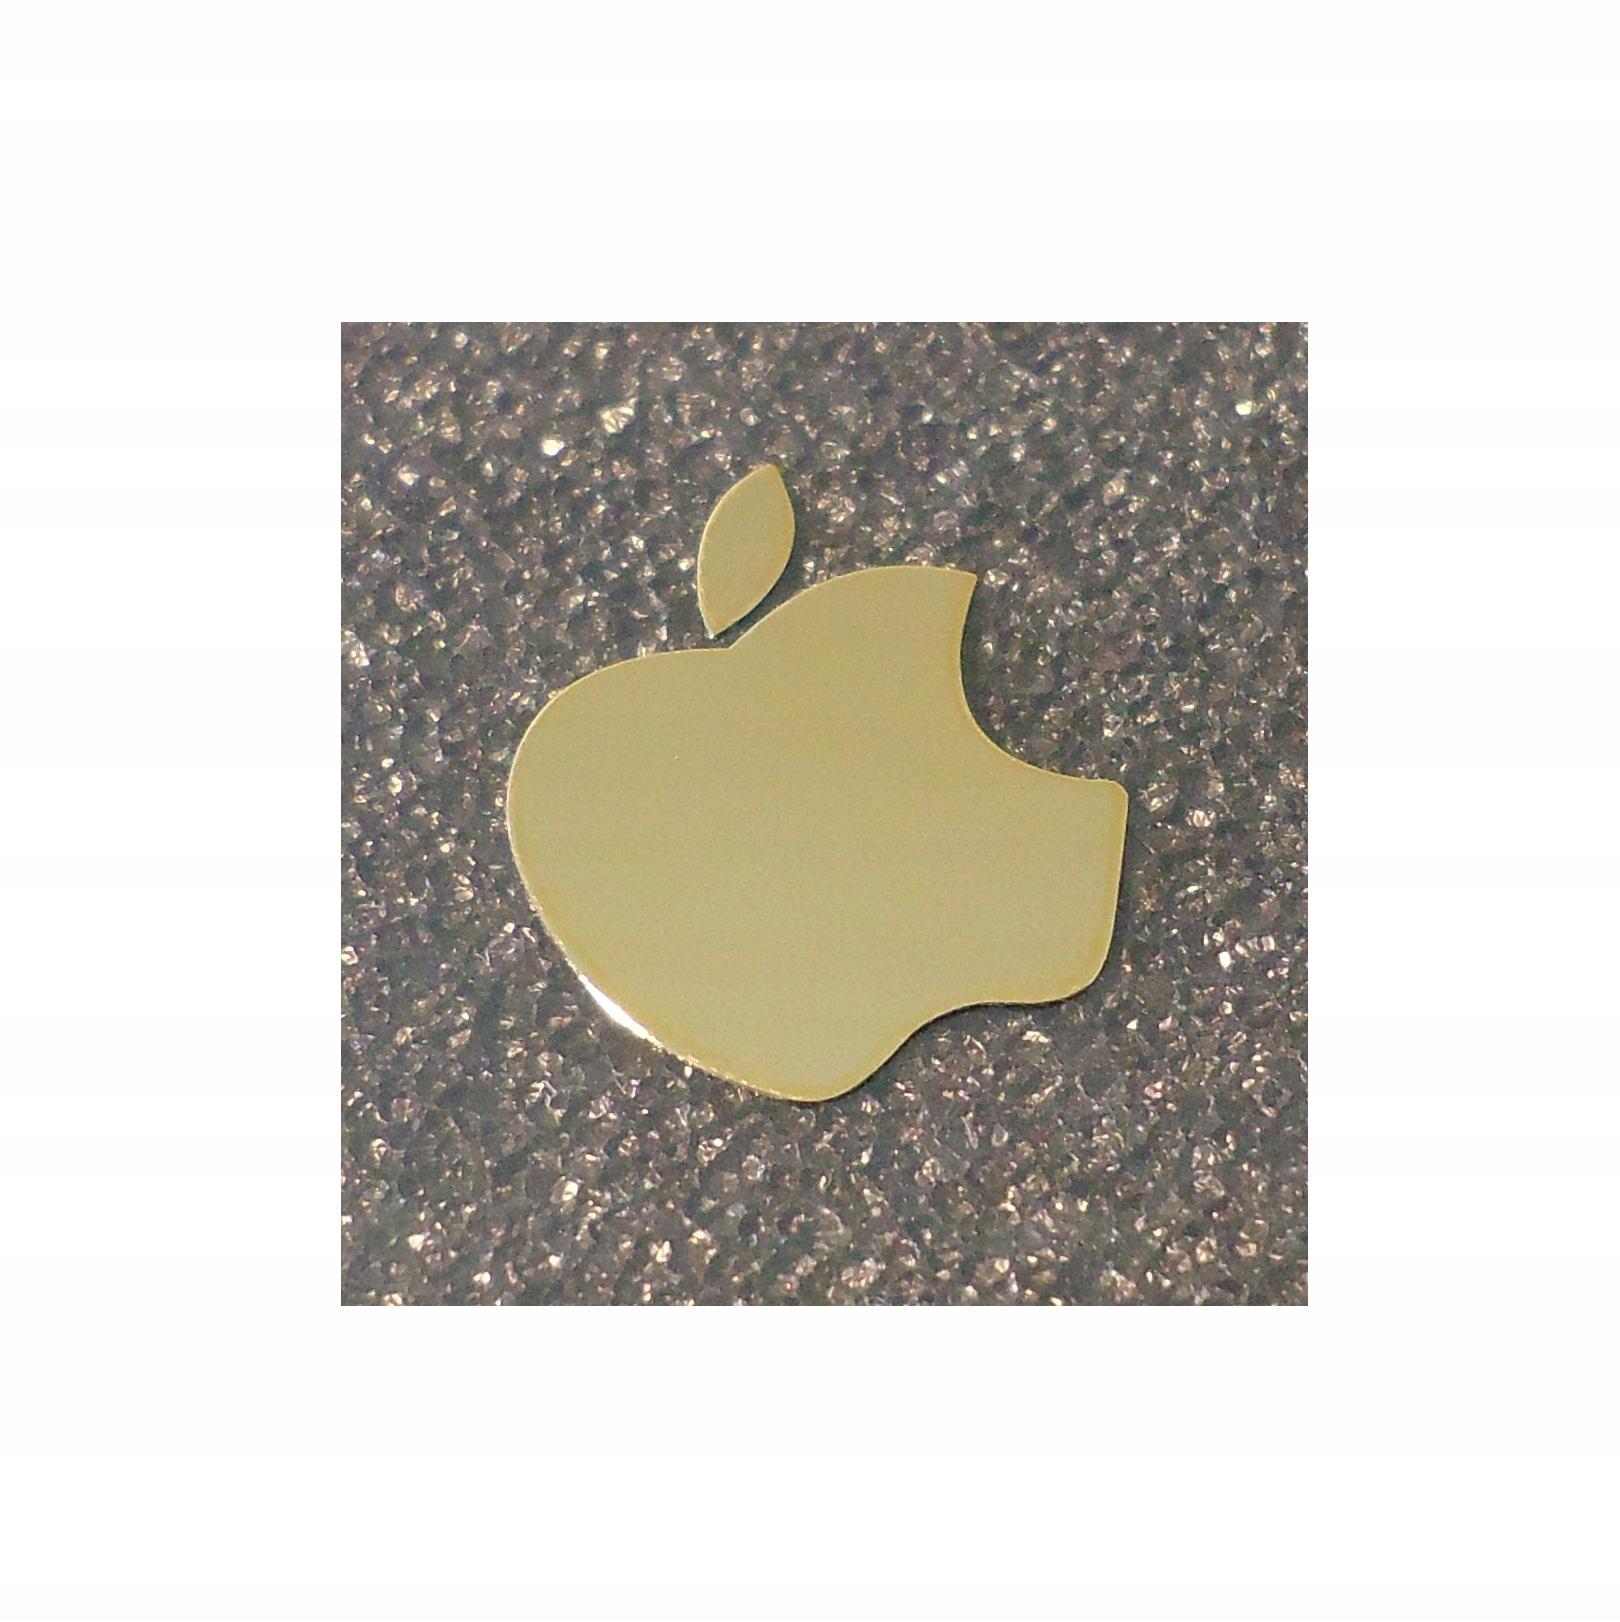 007g Apple Gold Metal Edition 13 x15 mm